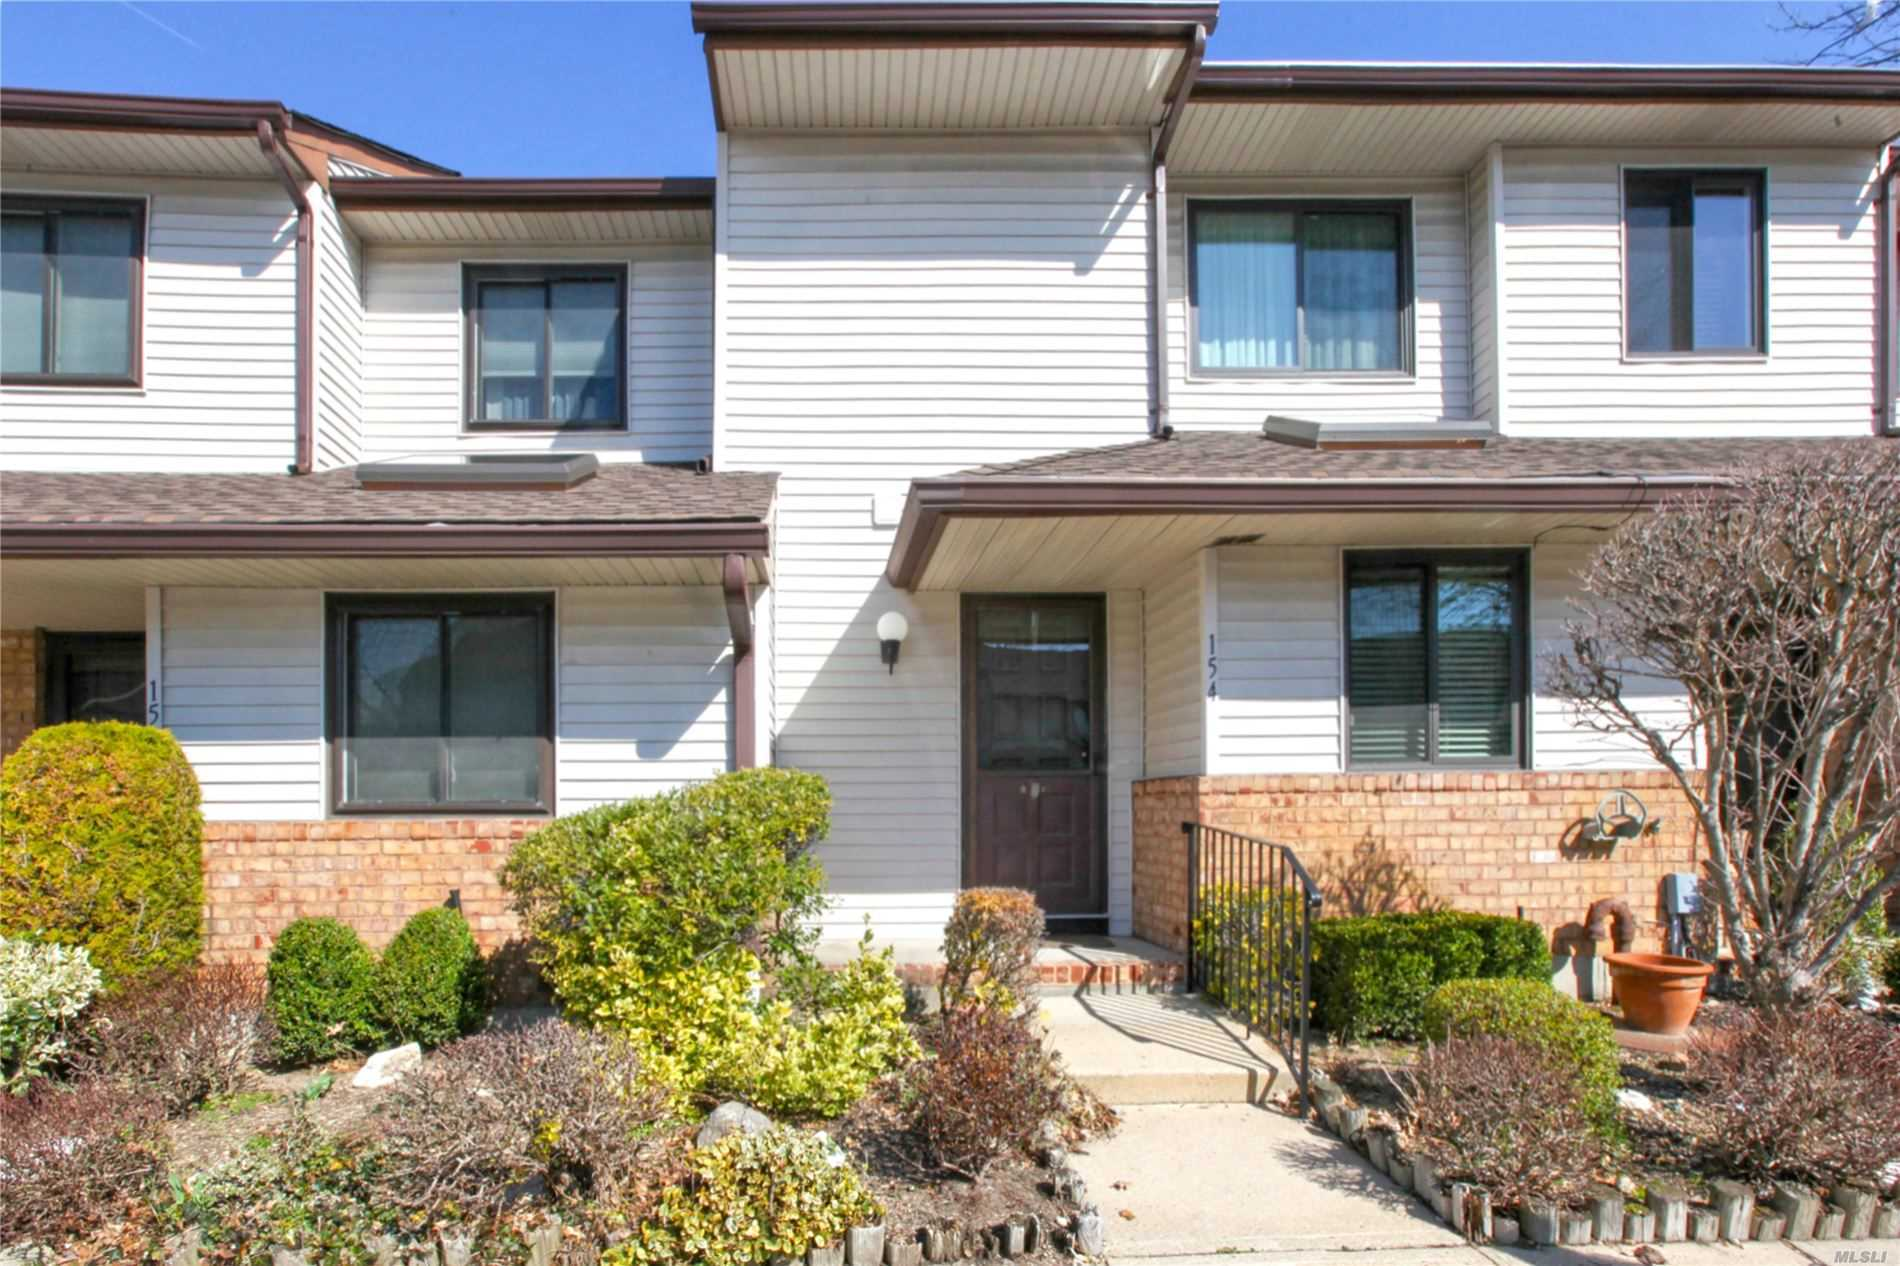 Property for sale at 154 Laurel Lane, Wantagh NY 11793, Wantagh,  New York 11793